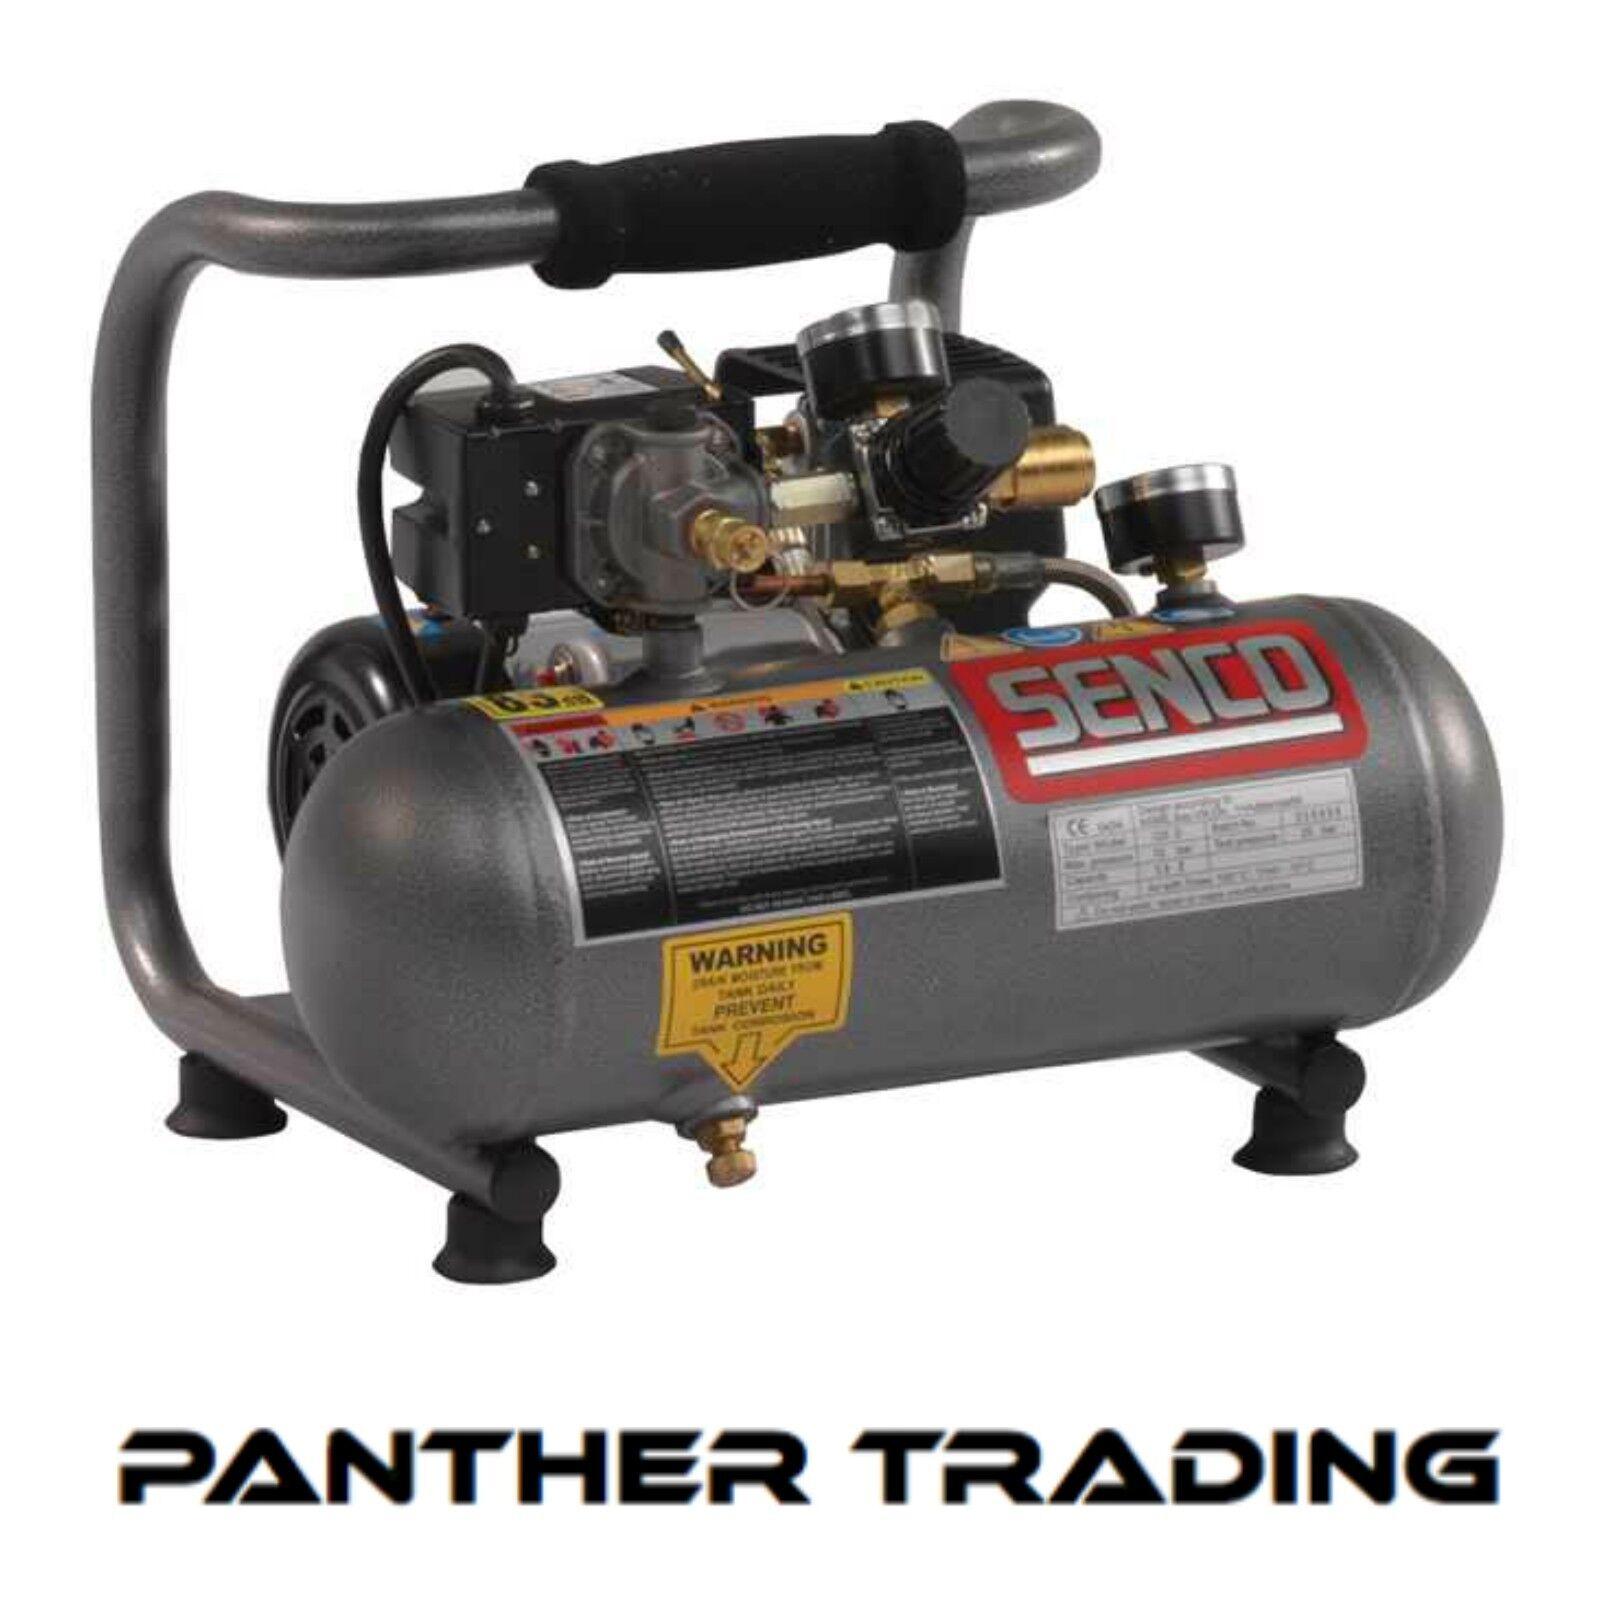 Senco portable compact compressor 0 5 hp 110v or 230v for 5 hp 110v electric motor